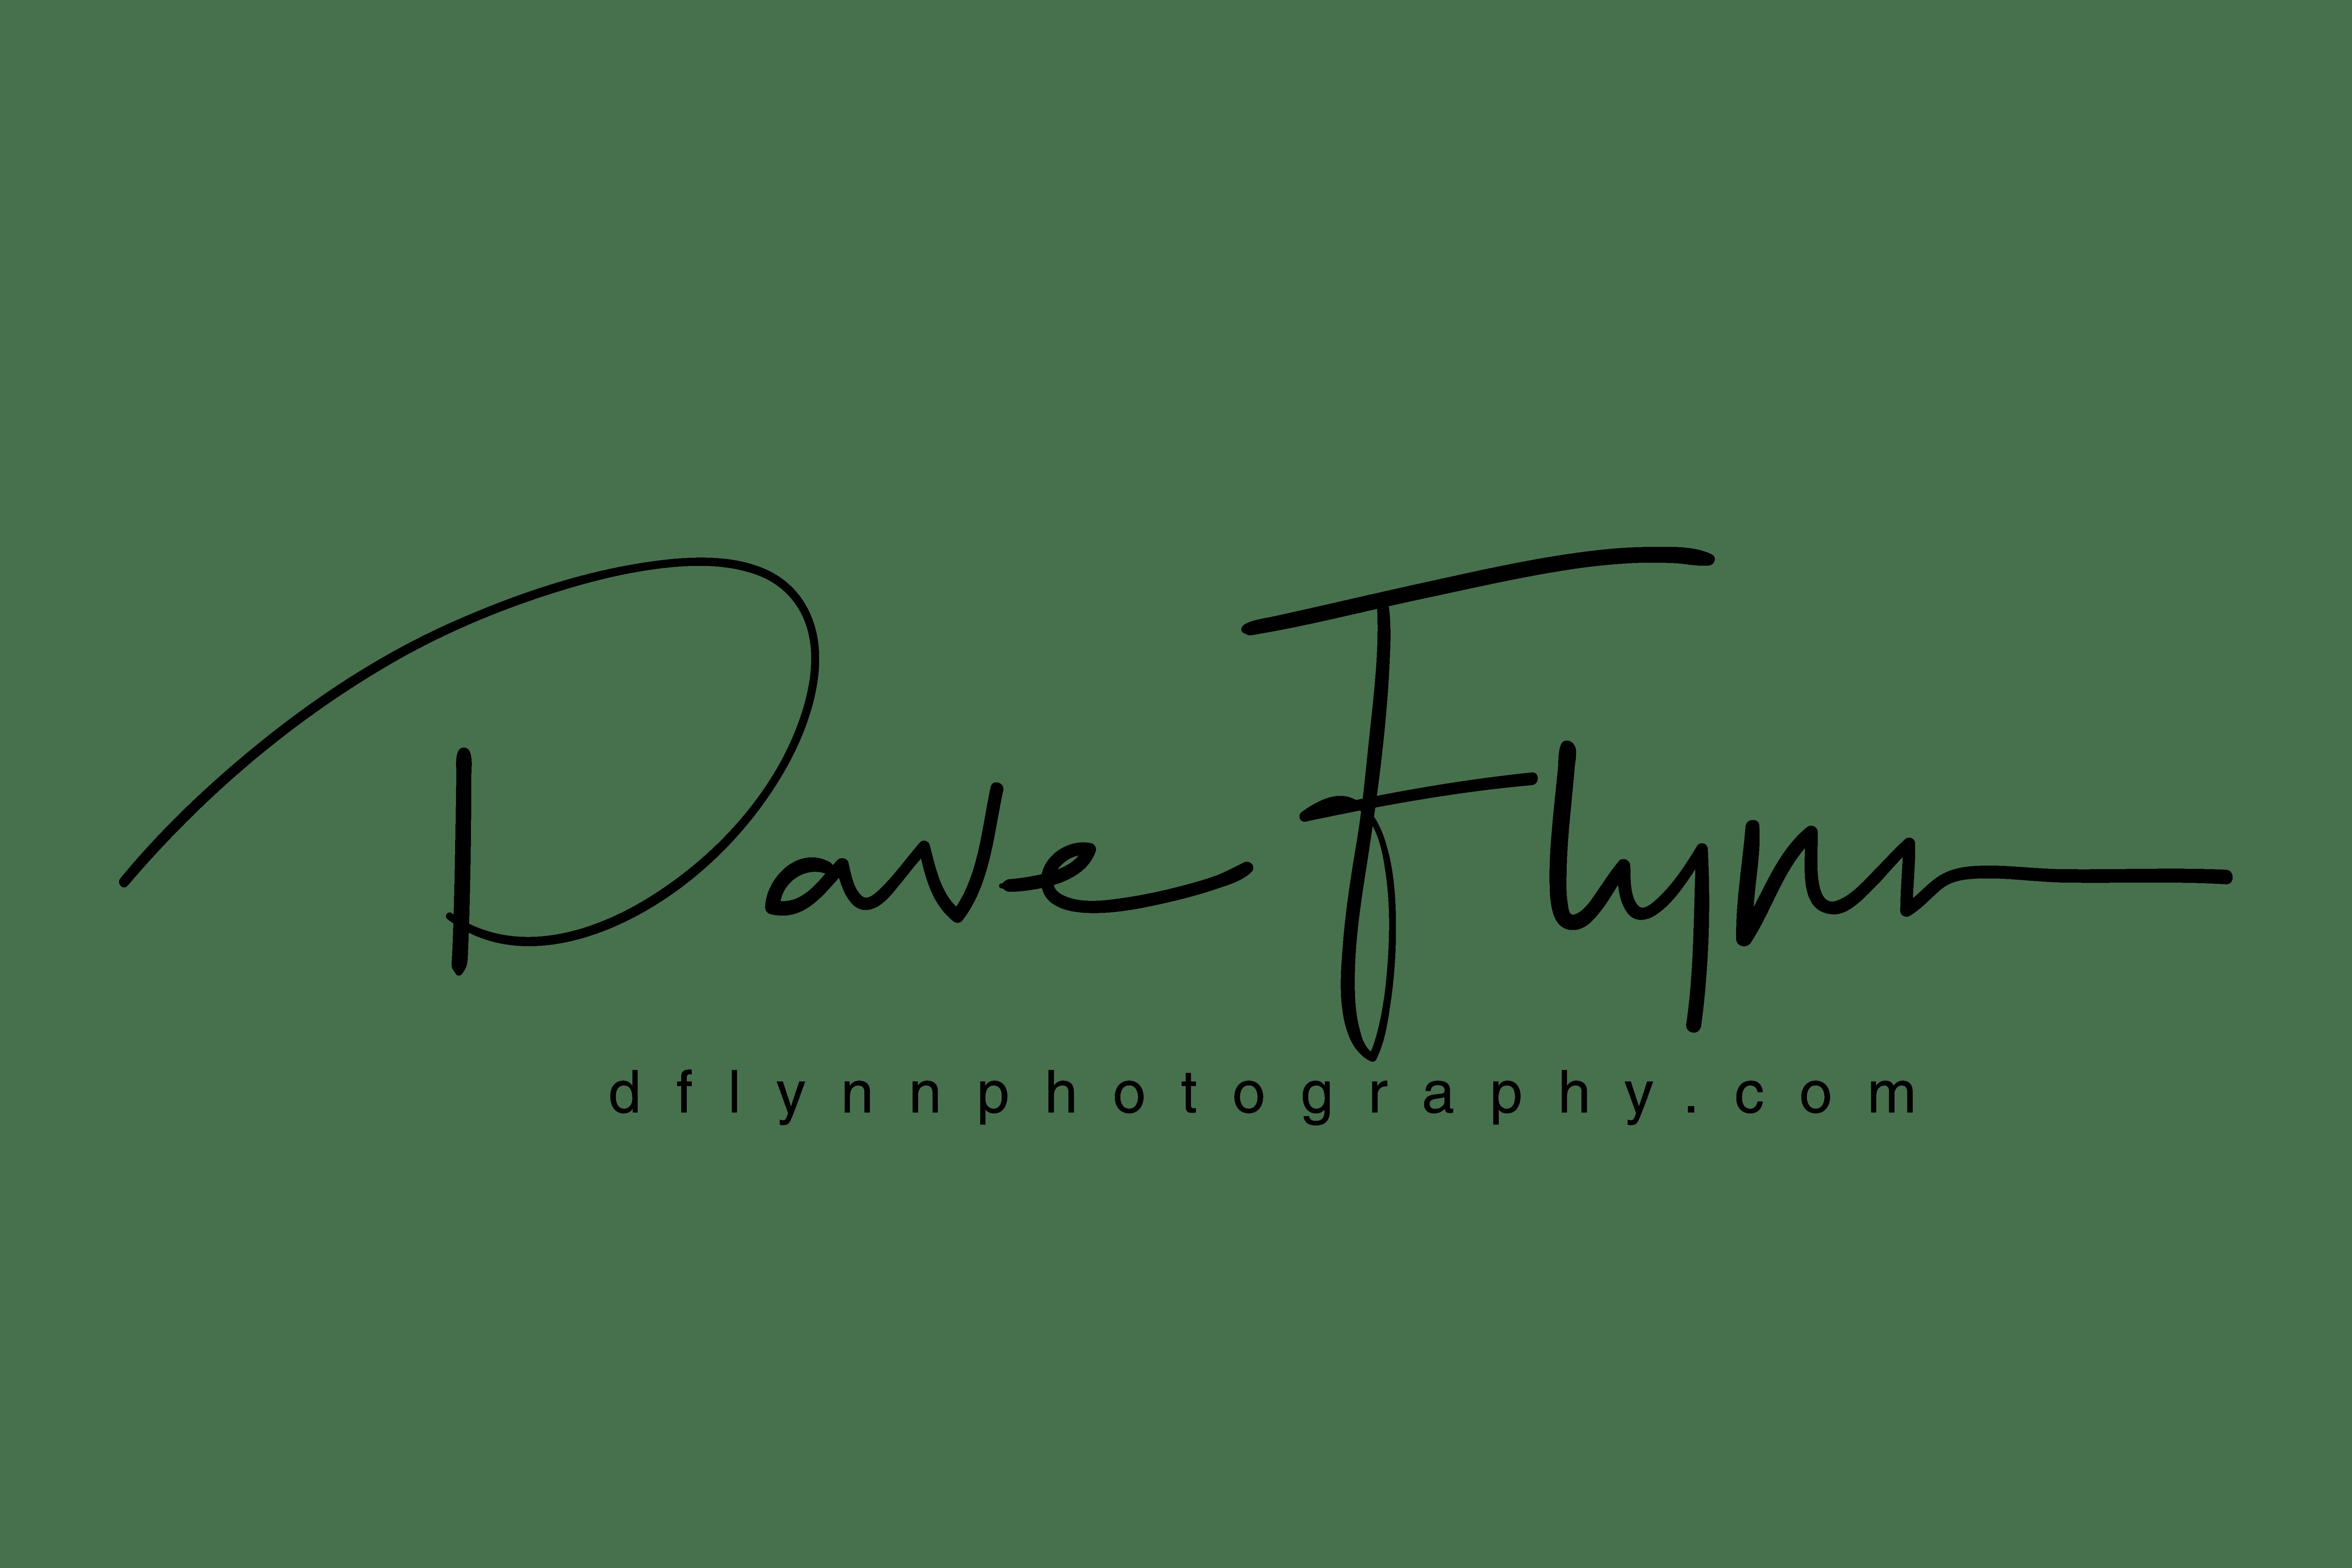 Dave Flynn Photography